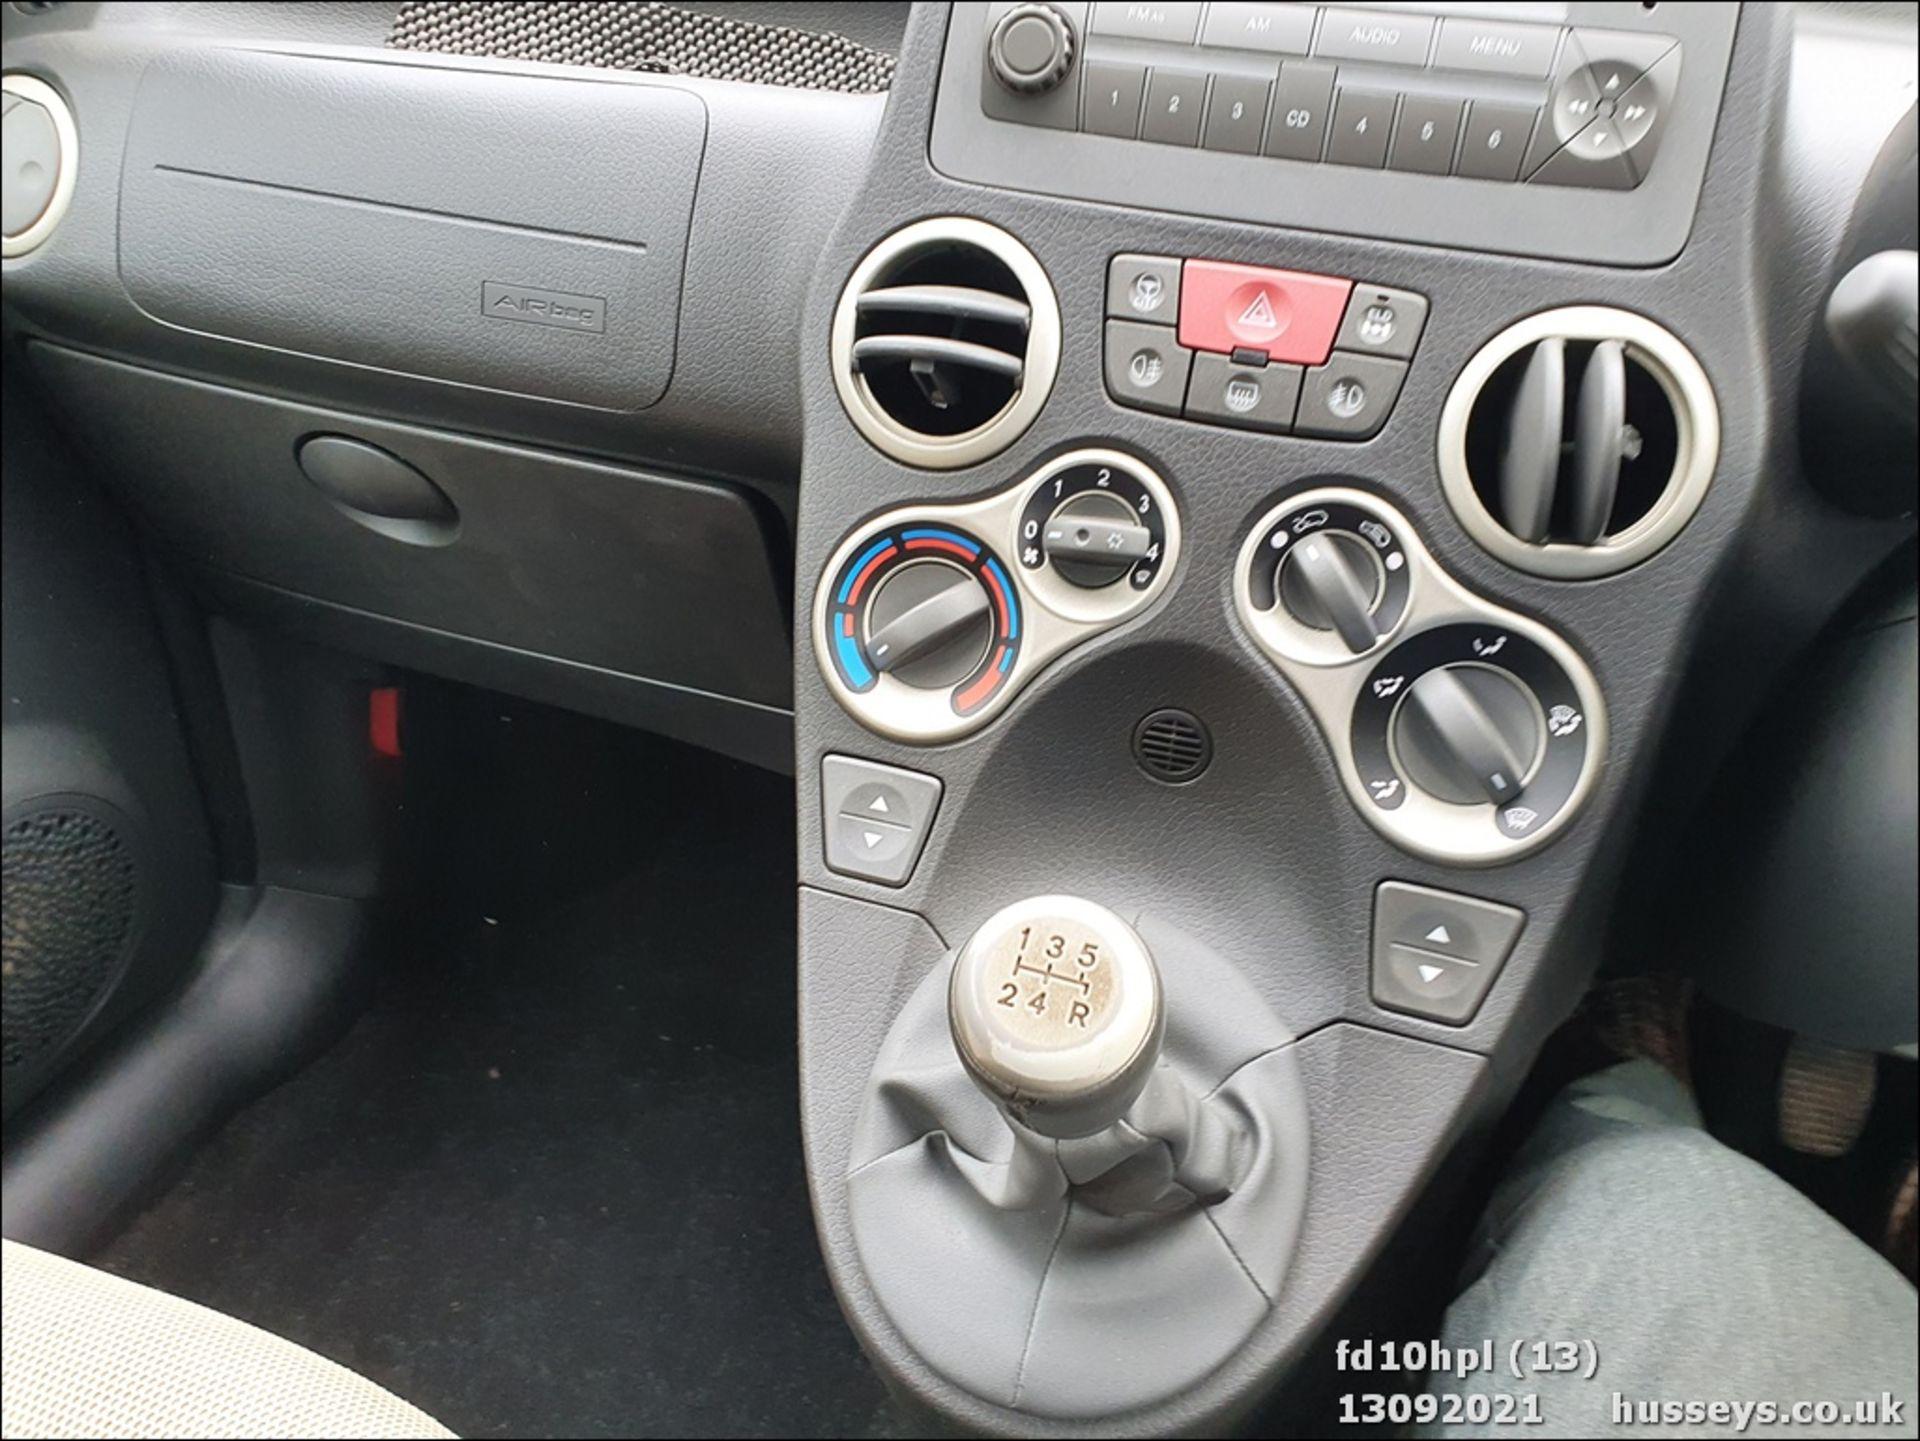 10/10 FIAT PANDA CROSS M-JET 4X4 - 1248cc 5dr Hatchback (Green, 58k) - Image 13 of 15